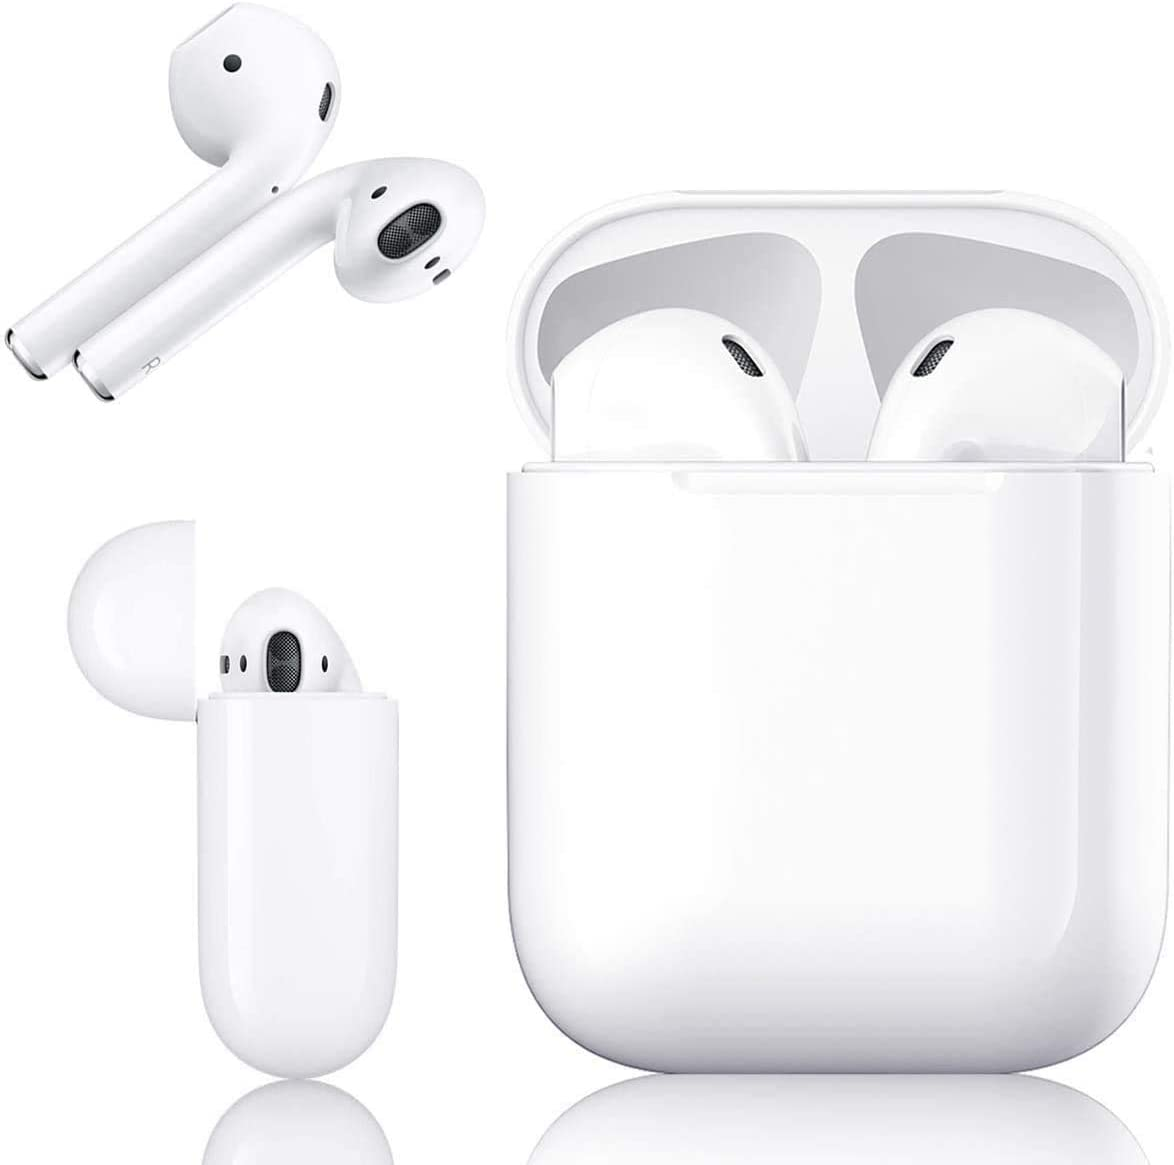 Bluetooth, Auriculares inalámbricos Bluetooth In-Ear Mini Auriculares Auriculares,emparejamiento automático emergente,Deportivos para Apple/Airpods/Android/iPhone/Samsung